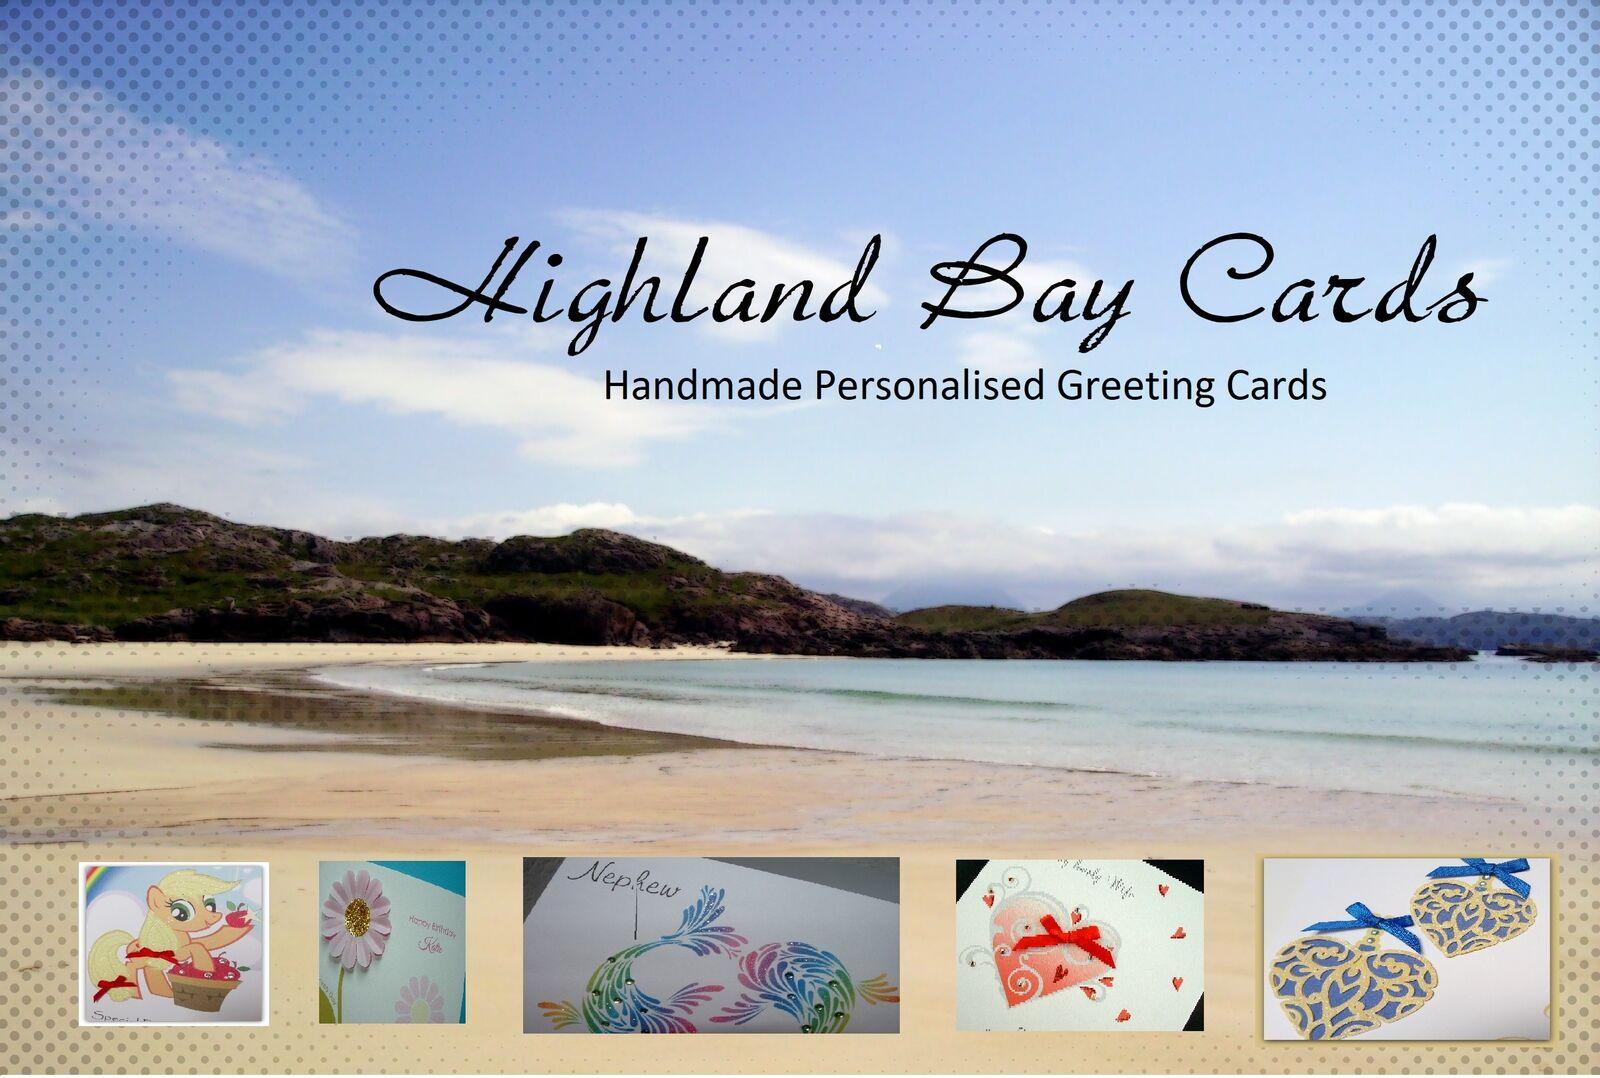 Highland Bay Cards